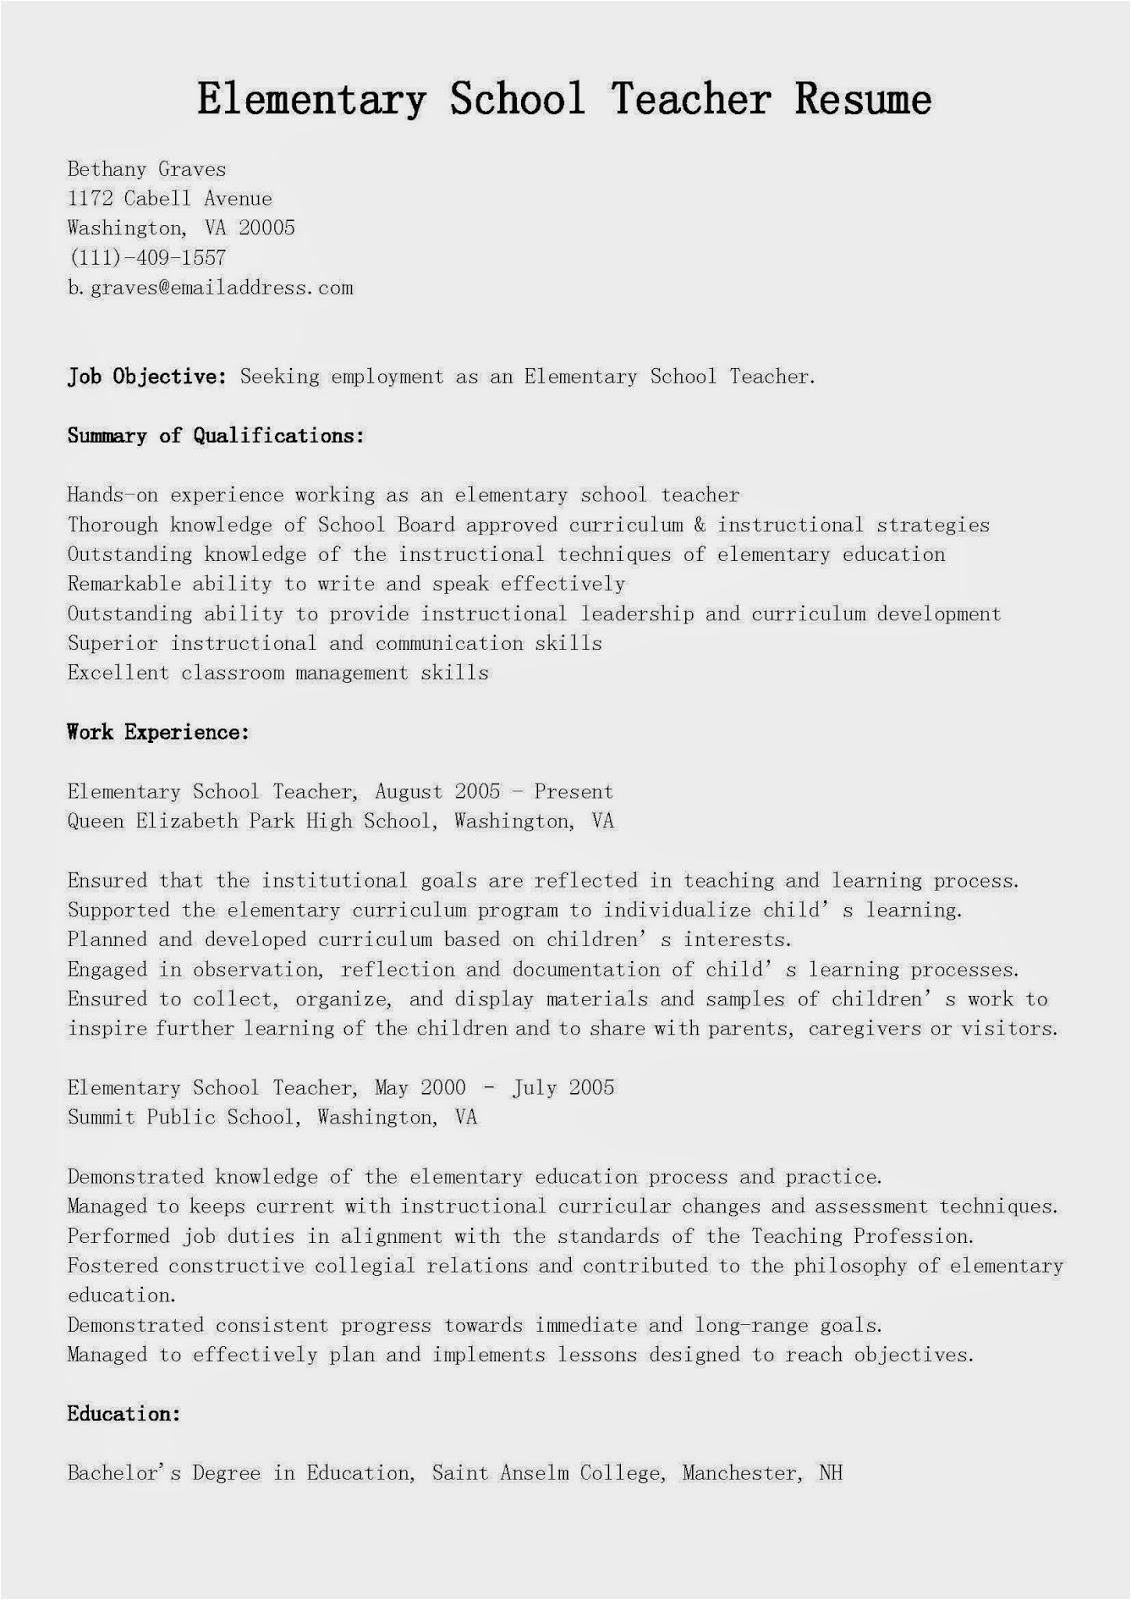 elementary education resume template